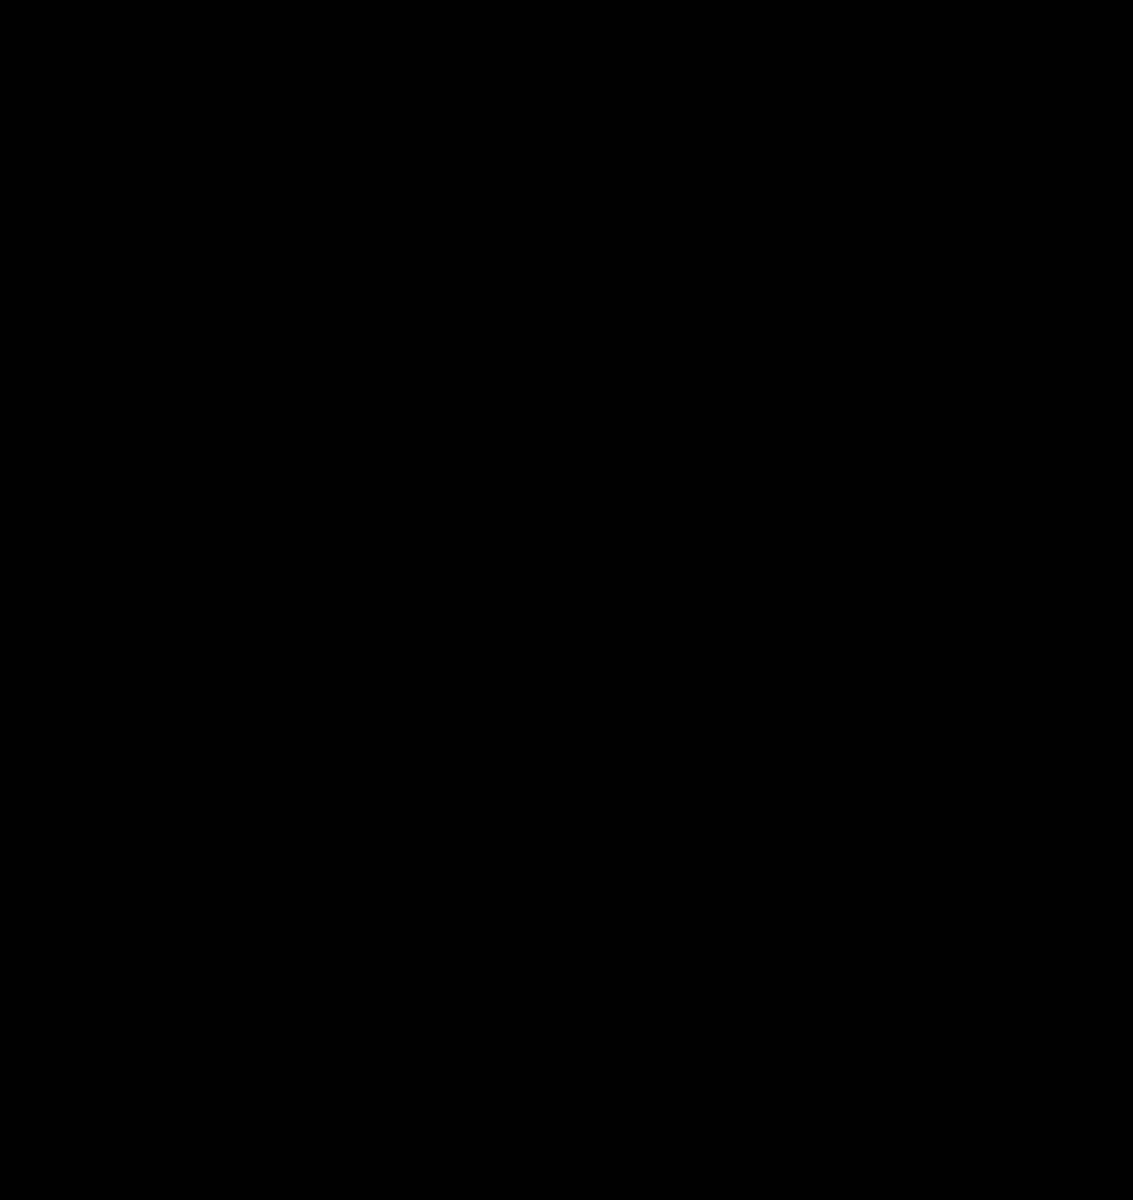 Mijncadeautje Unisex T-shirt zwart (maat XL) BBQ Specialist